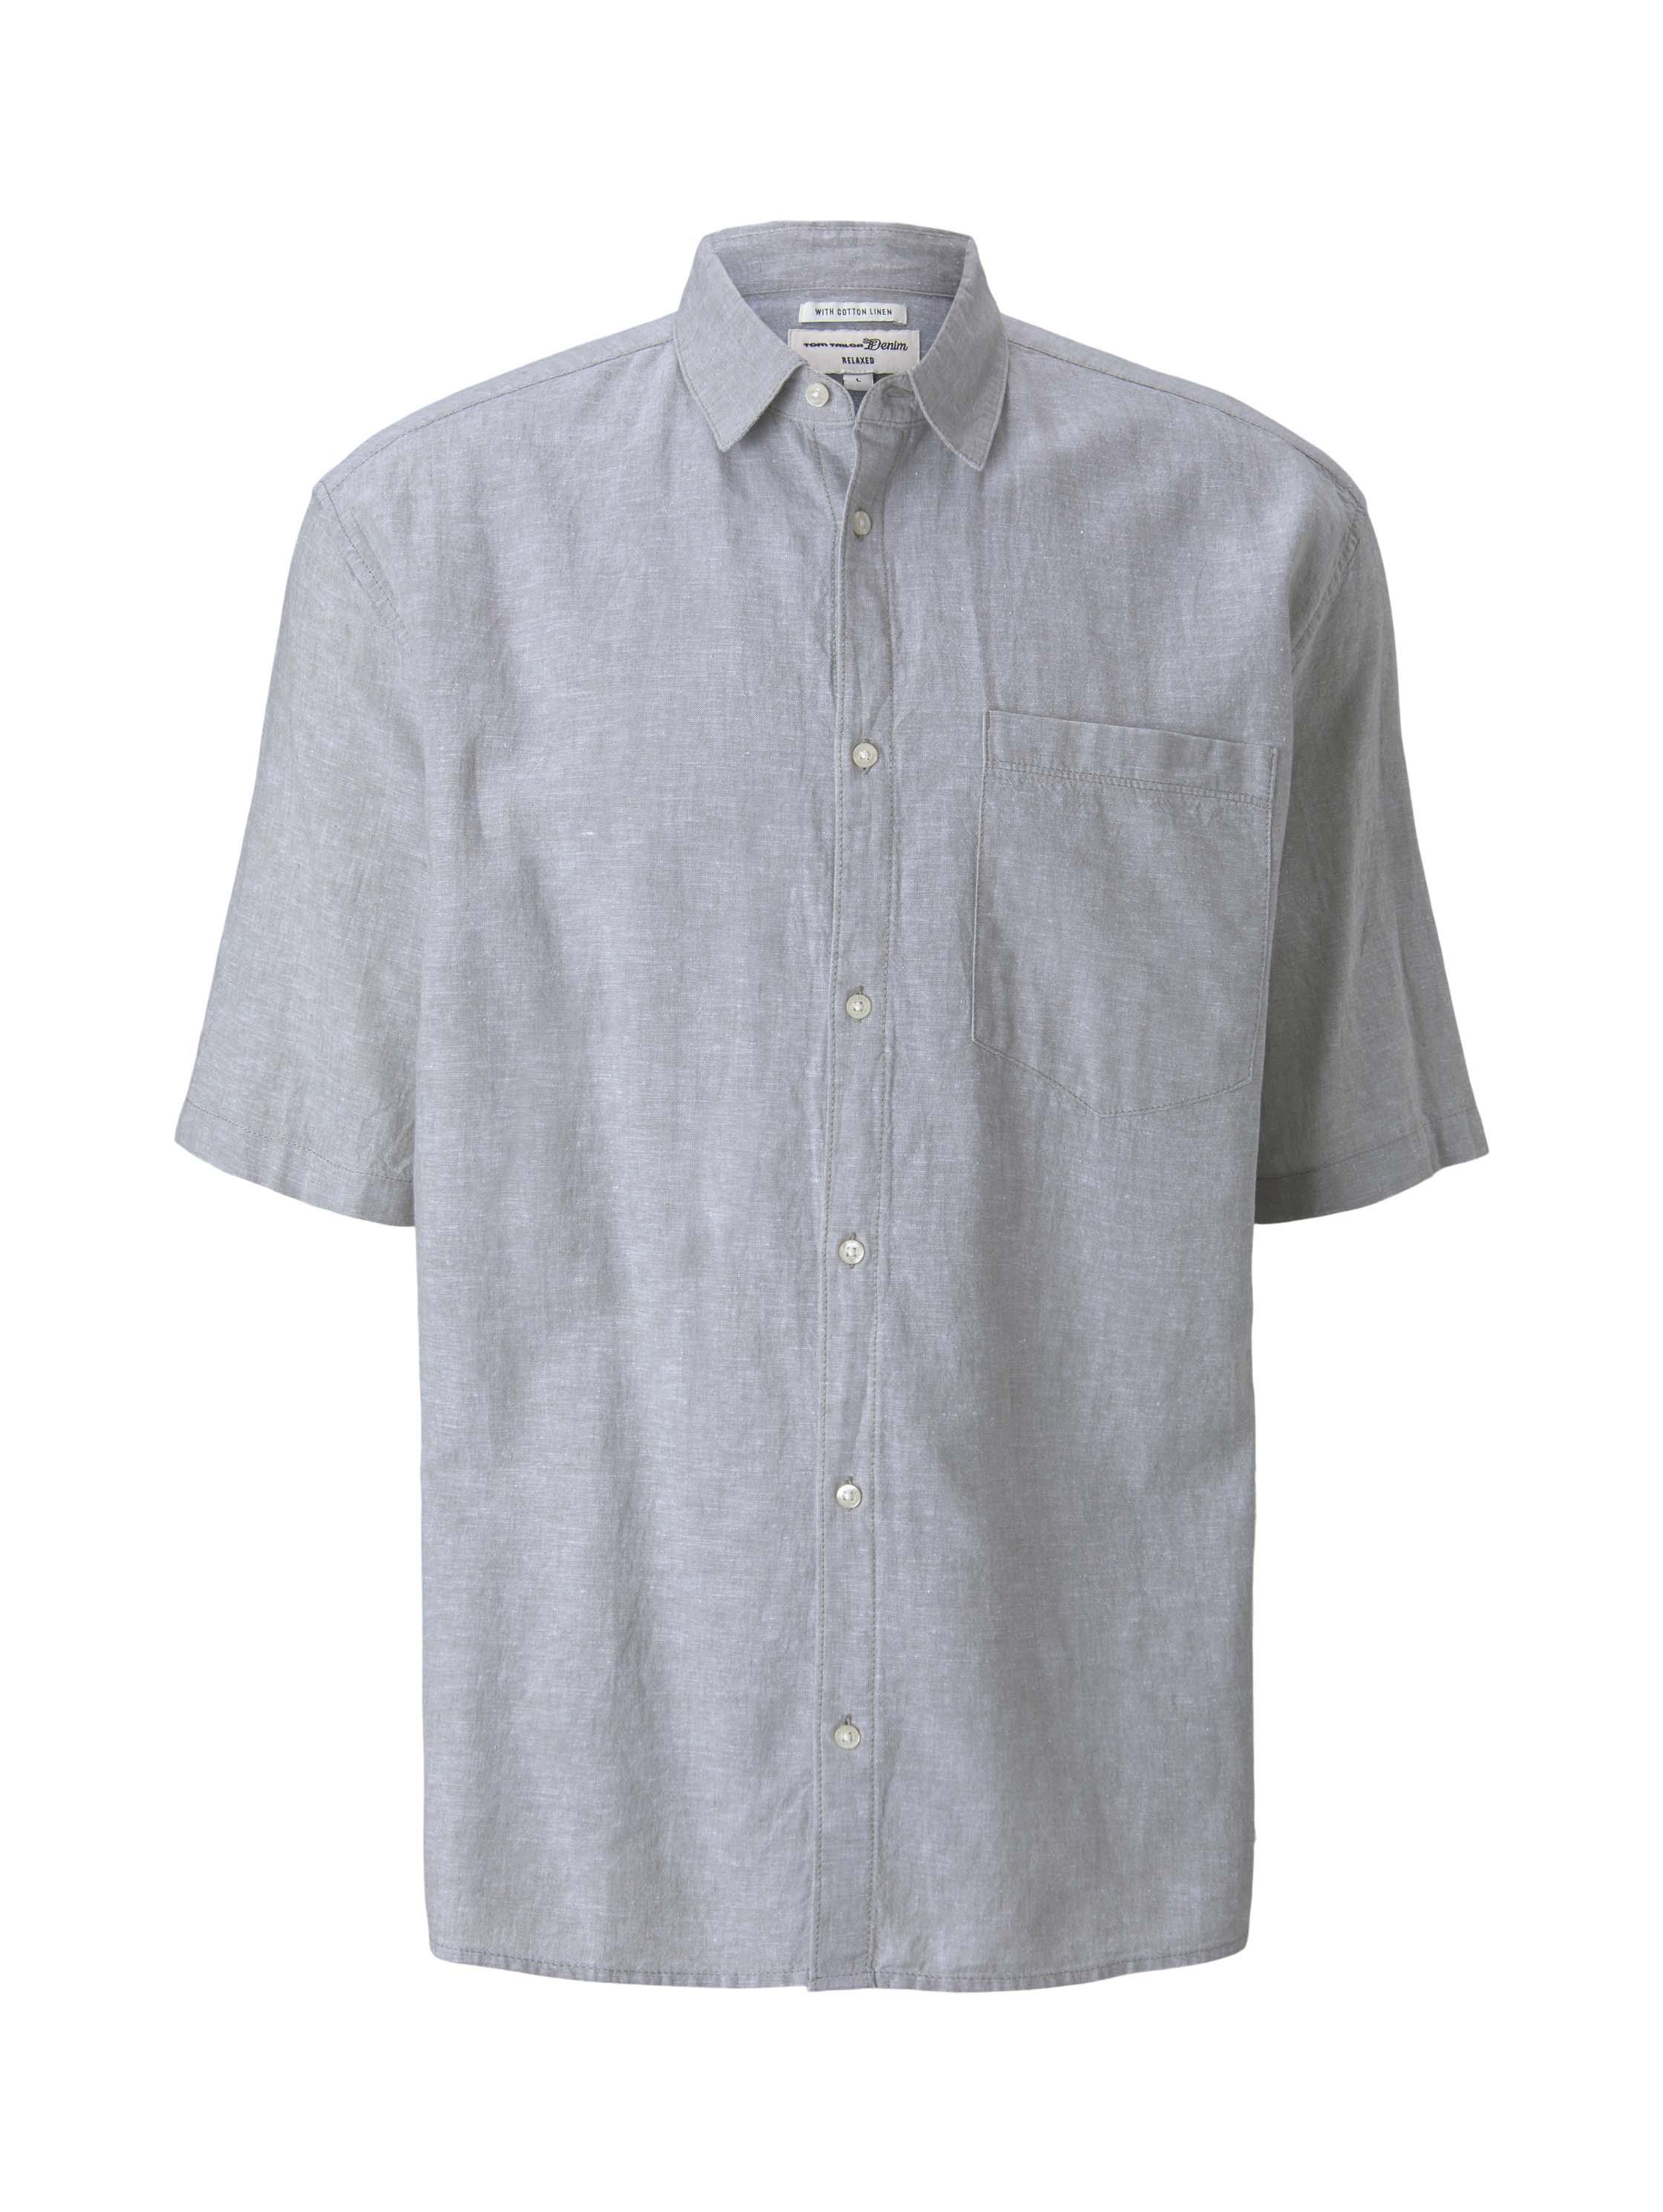 boxy linen short sleeve shirt, olive white chambray